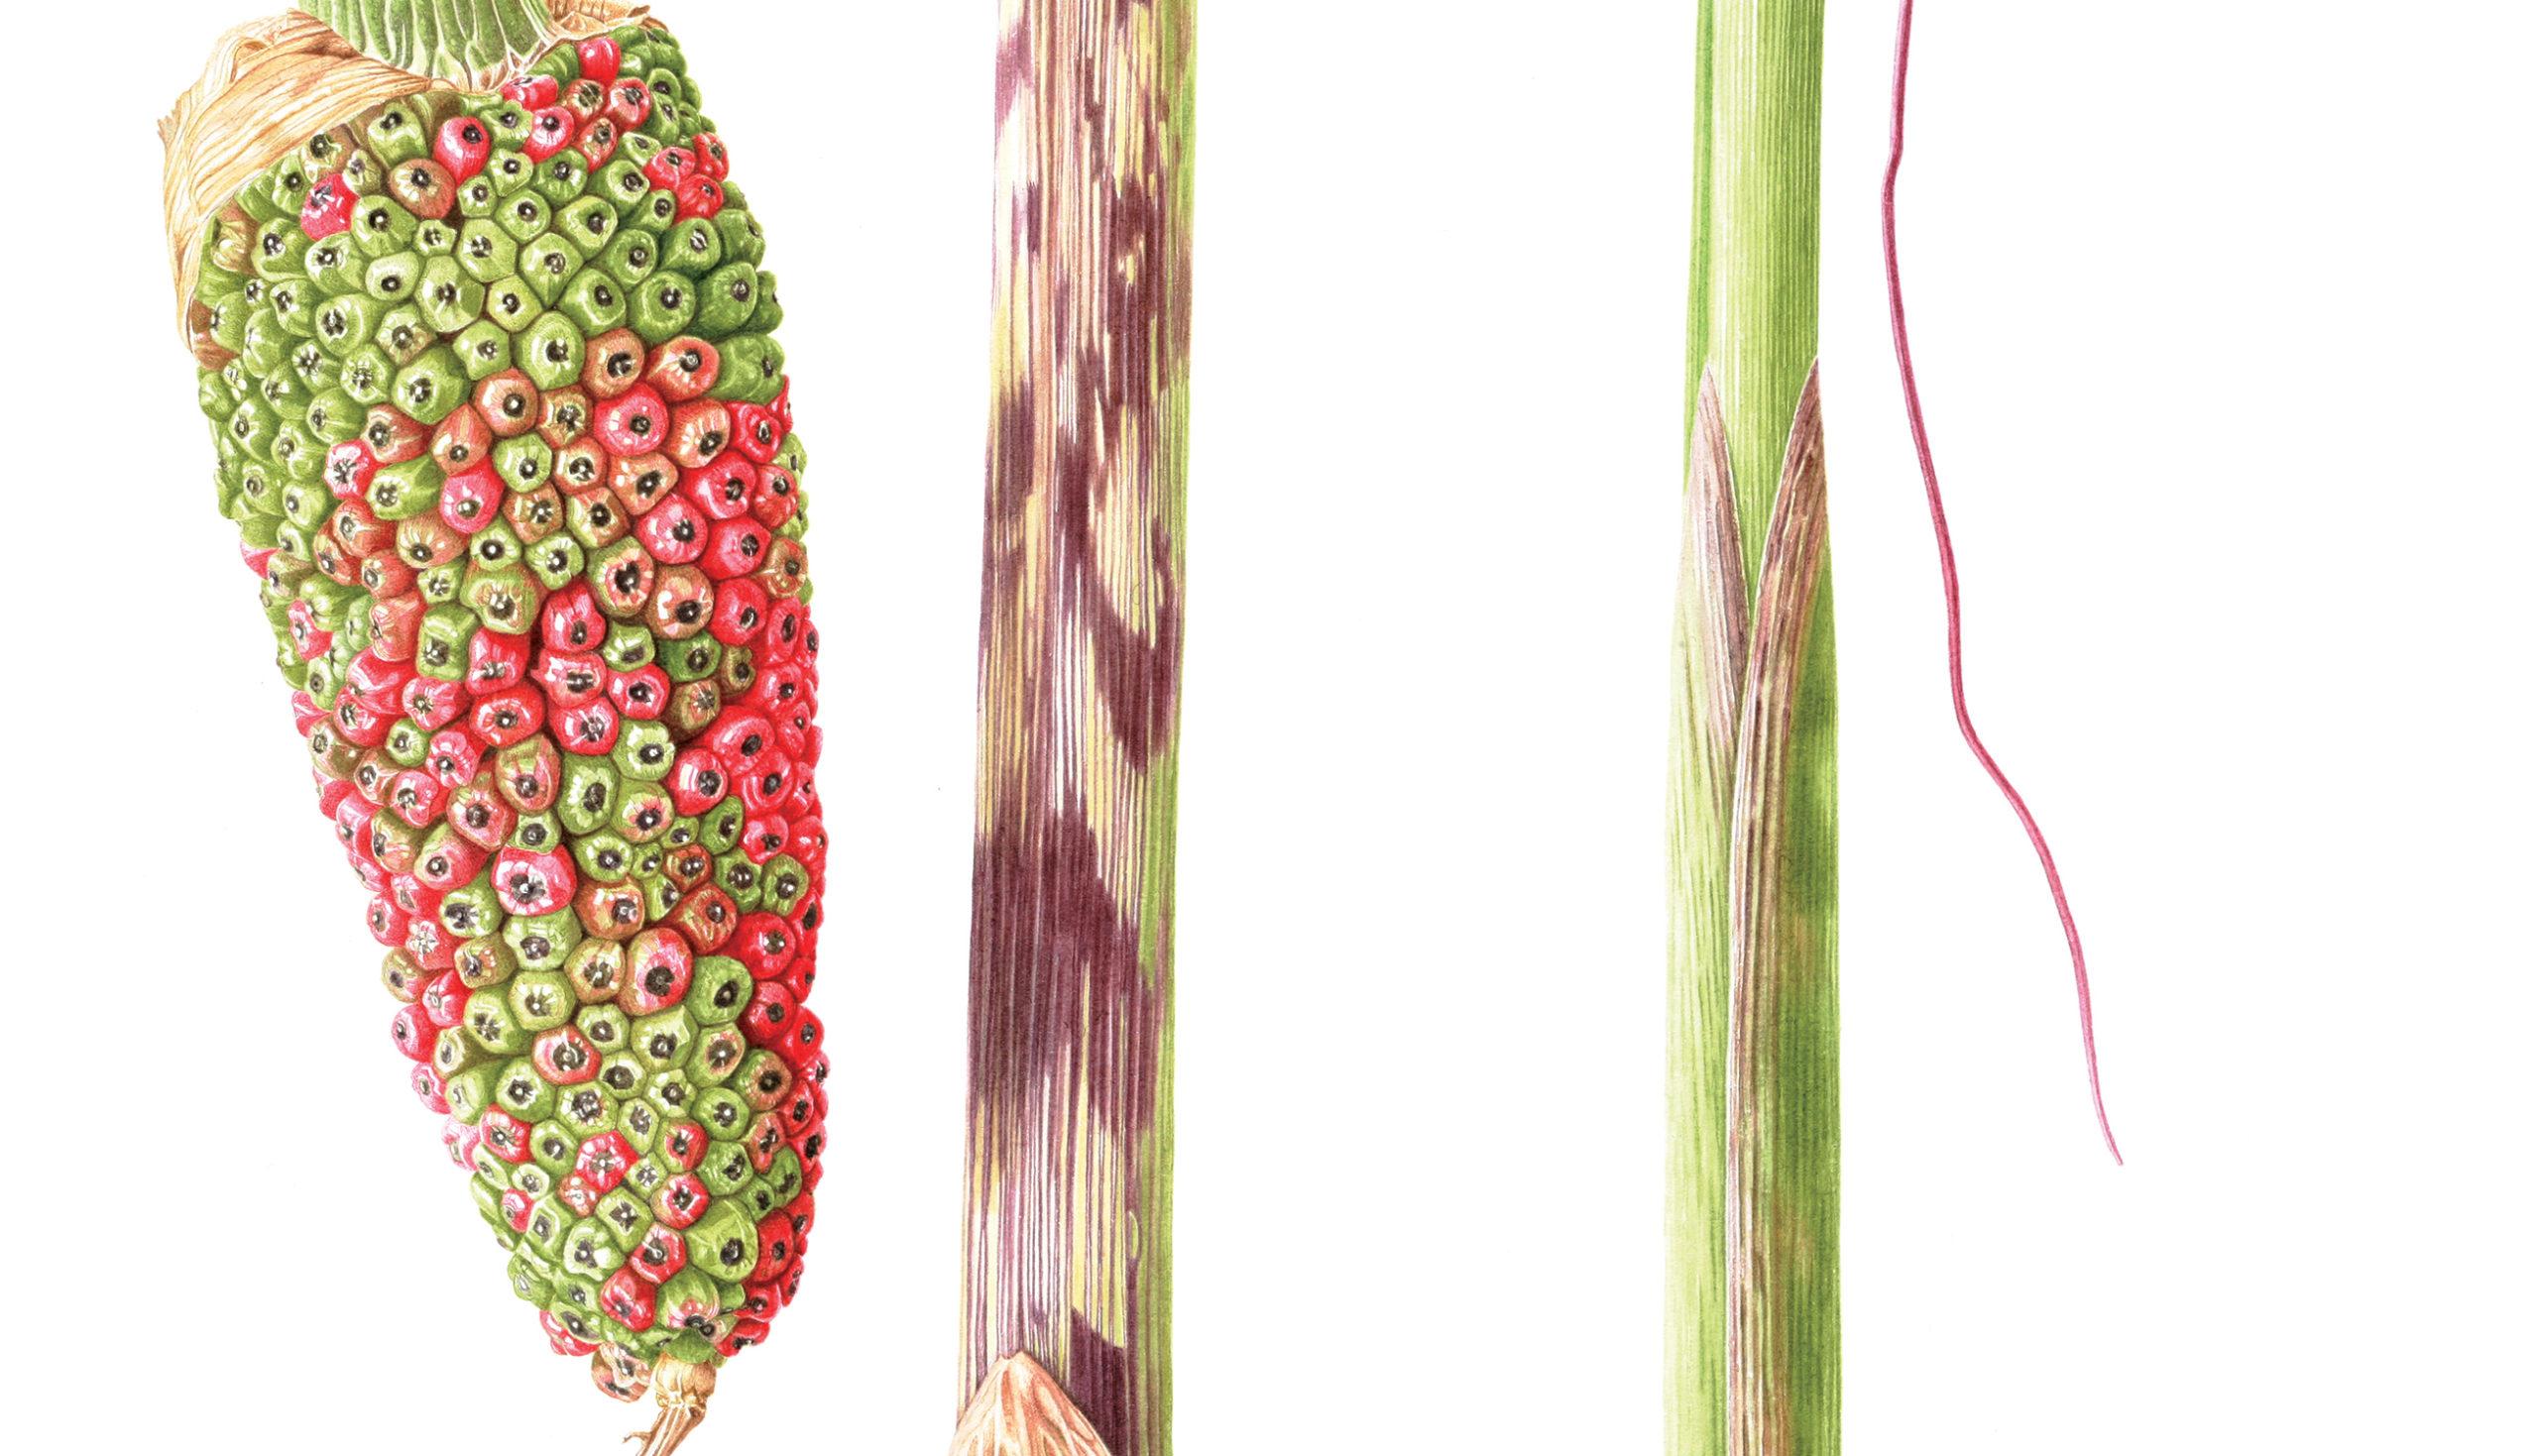 Ariseama consanguineum watercolour on Fabriano 5 - detail